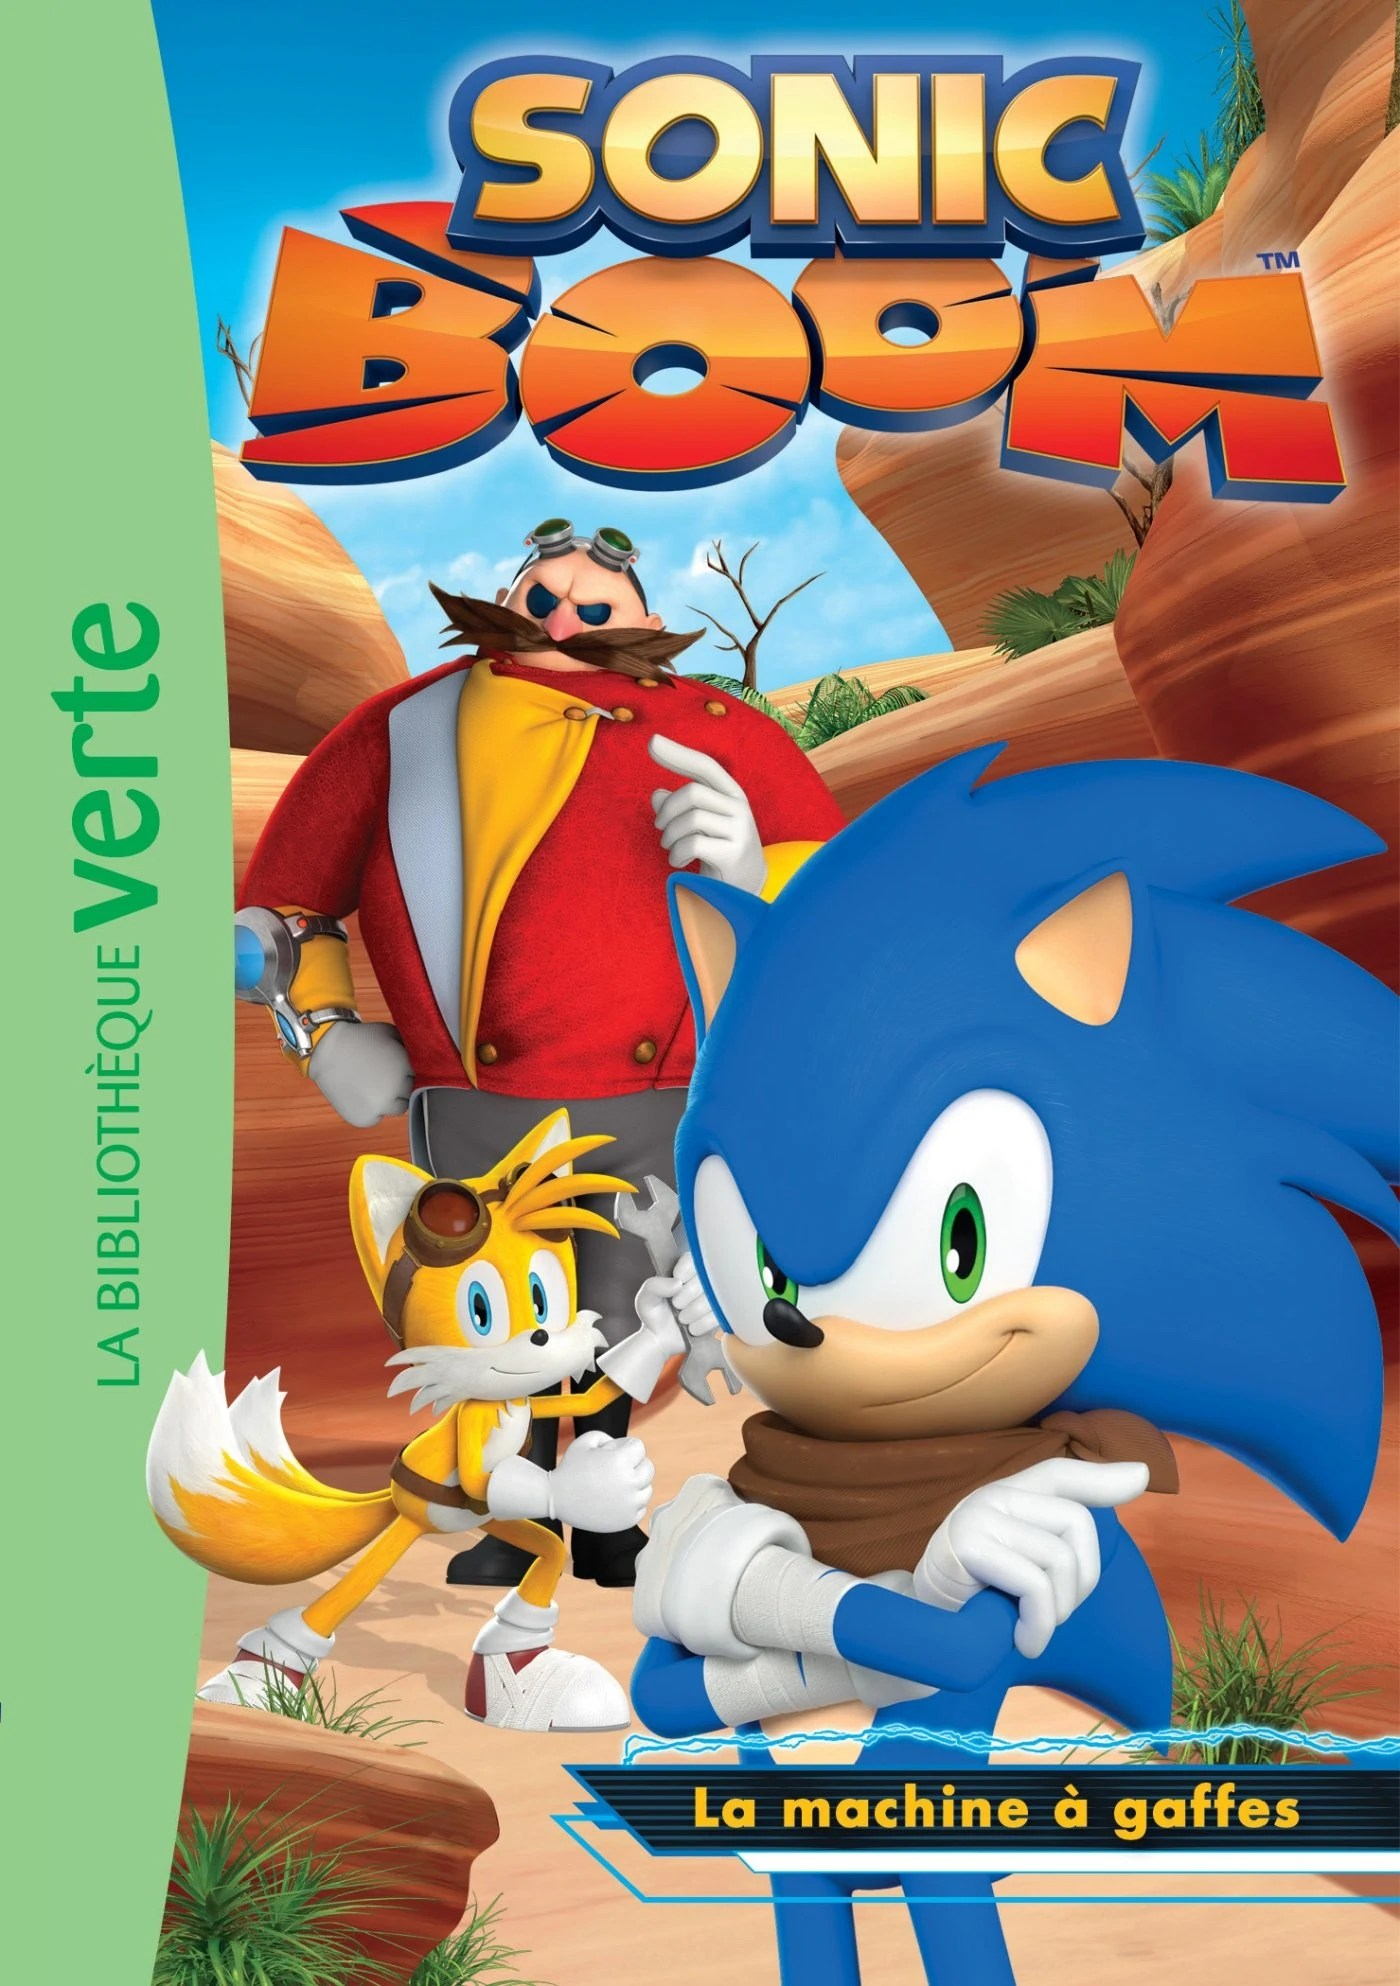 Sonic Boom 02 La machine à gaffes Sonic News Network